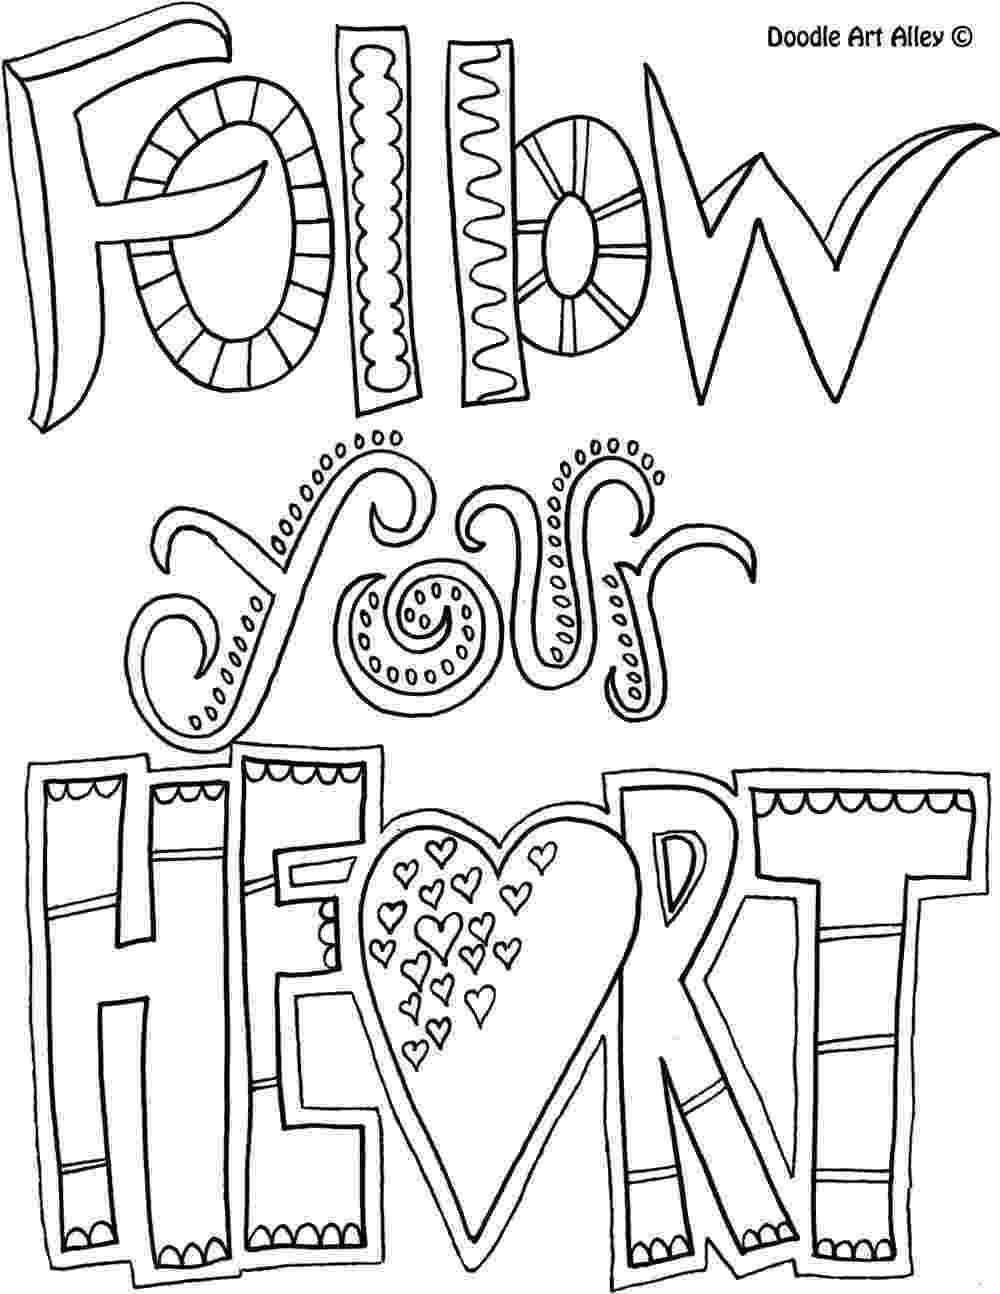 doodle art coloring book doodle art angela porter art doodle book coloring